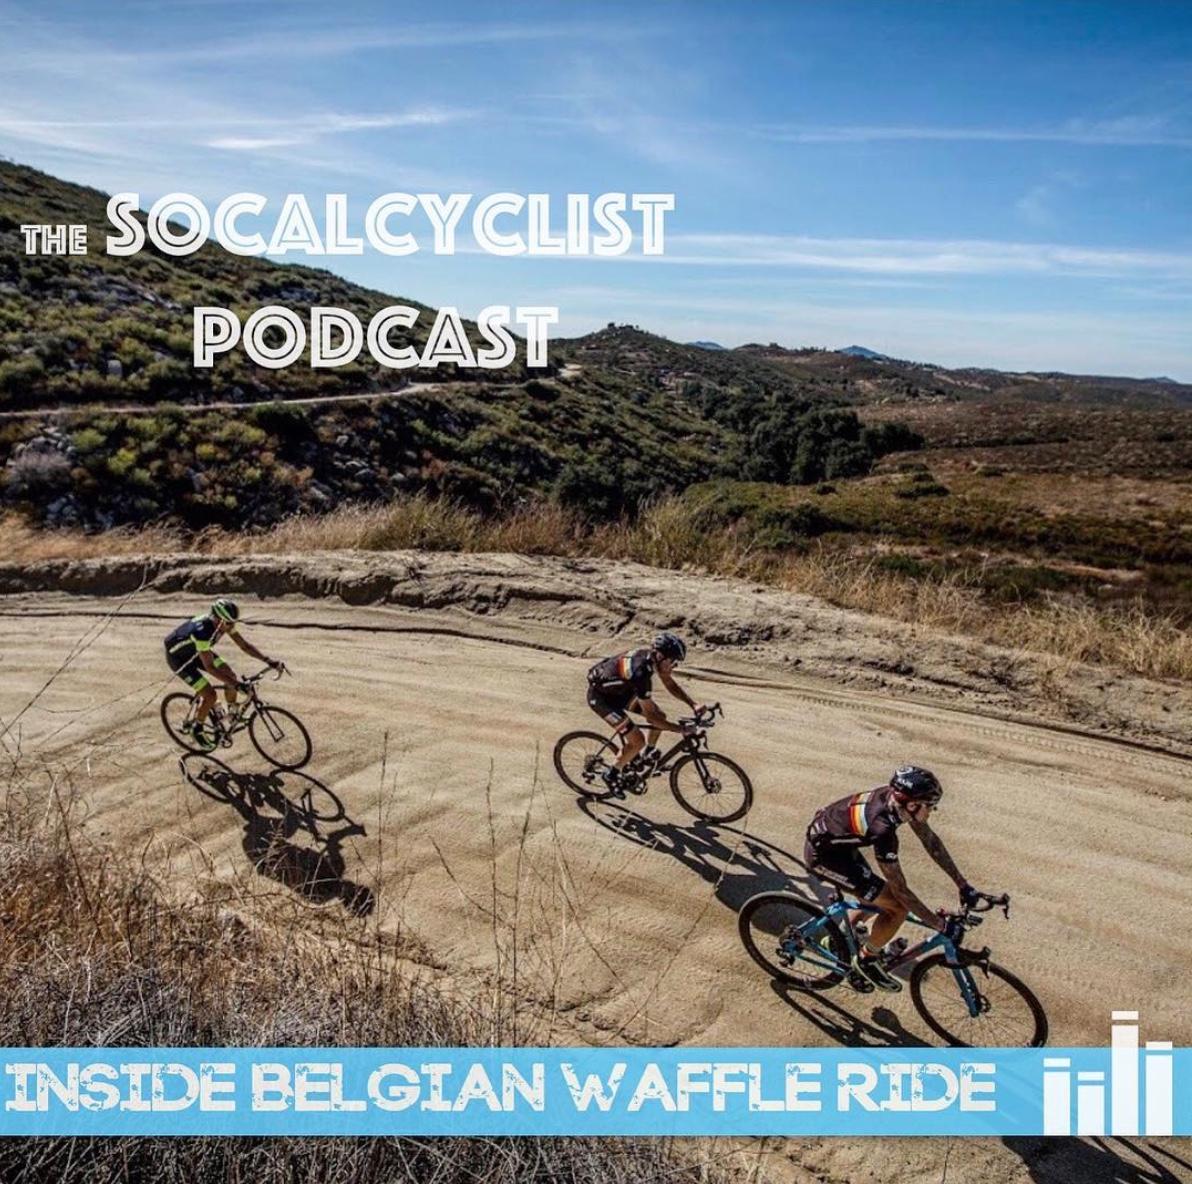 socal cyclist podcast bwr.jpeg